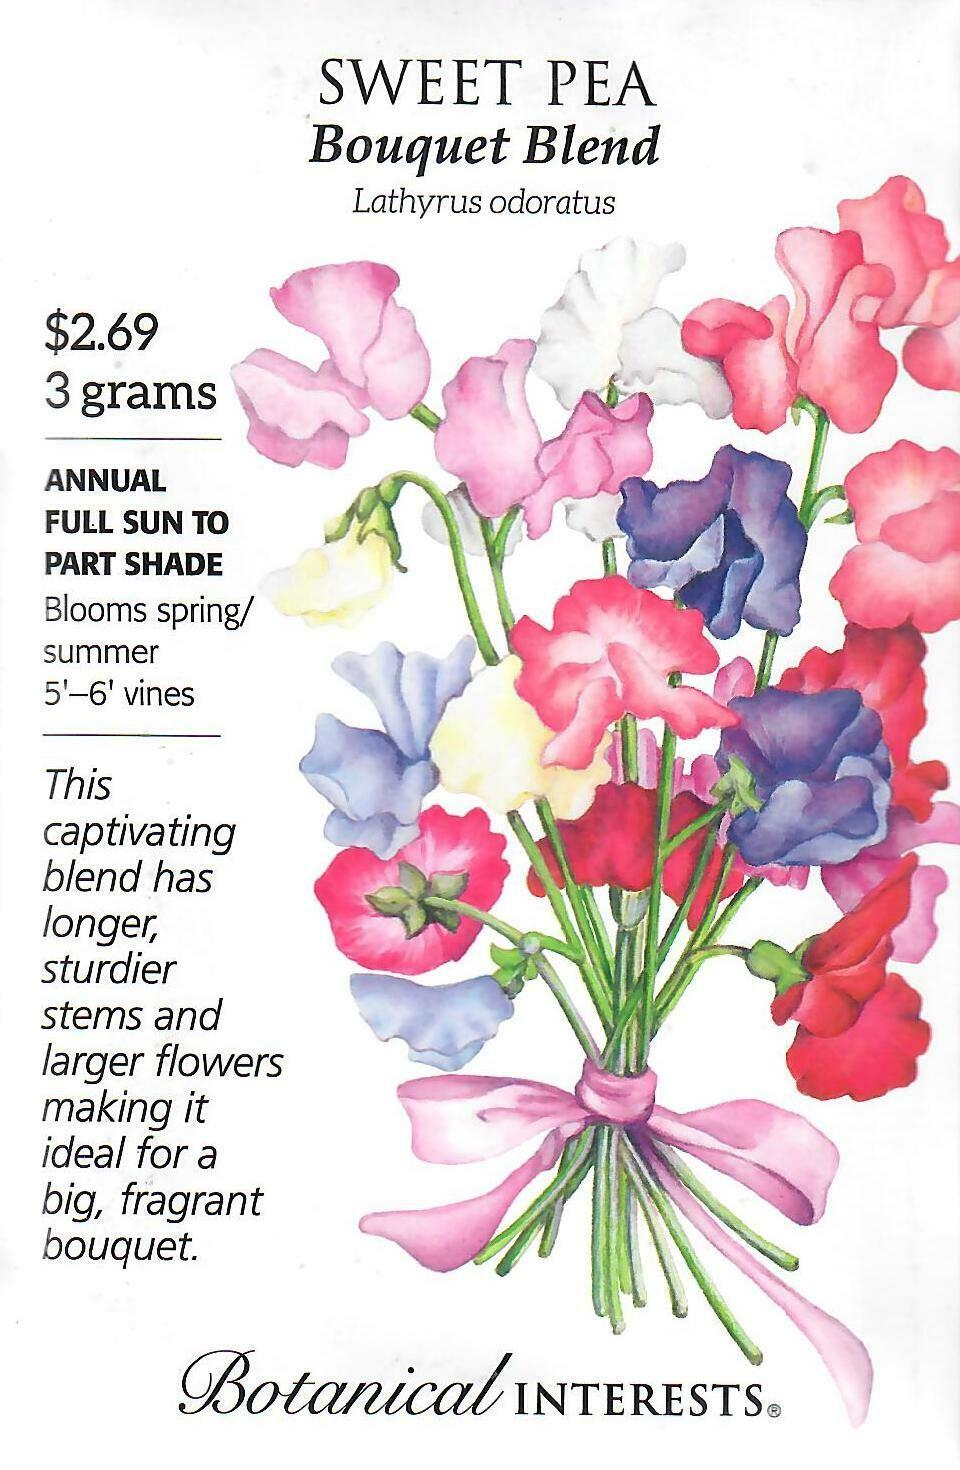 Sweet Pea Bouquet Blend Botanical Interests